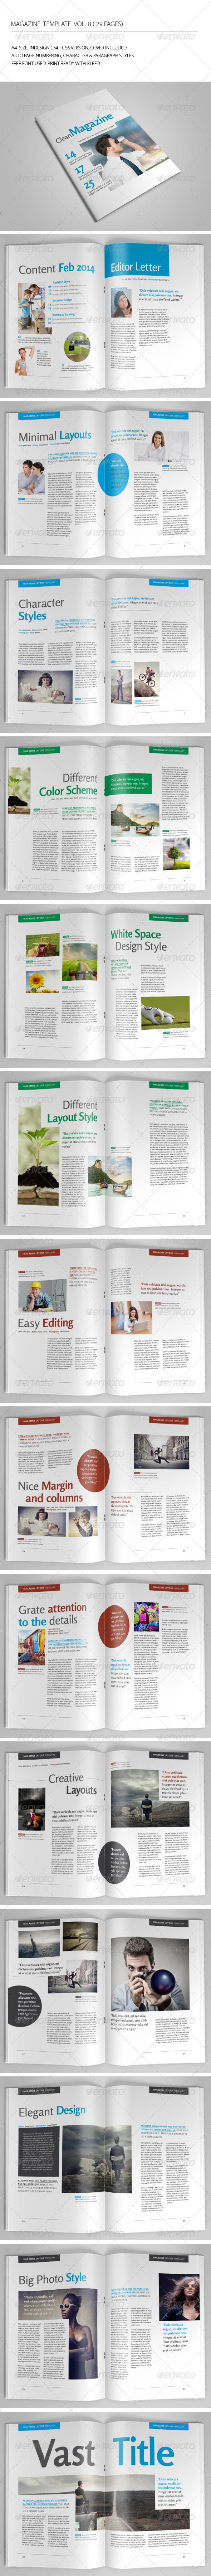 29 Pages Simple Magazine Vol8 - Magazines Print Templates